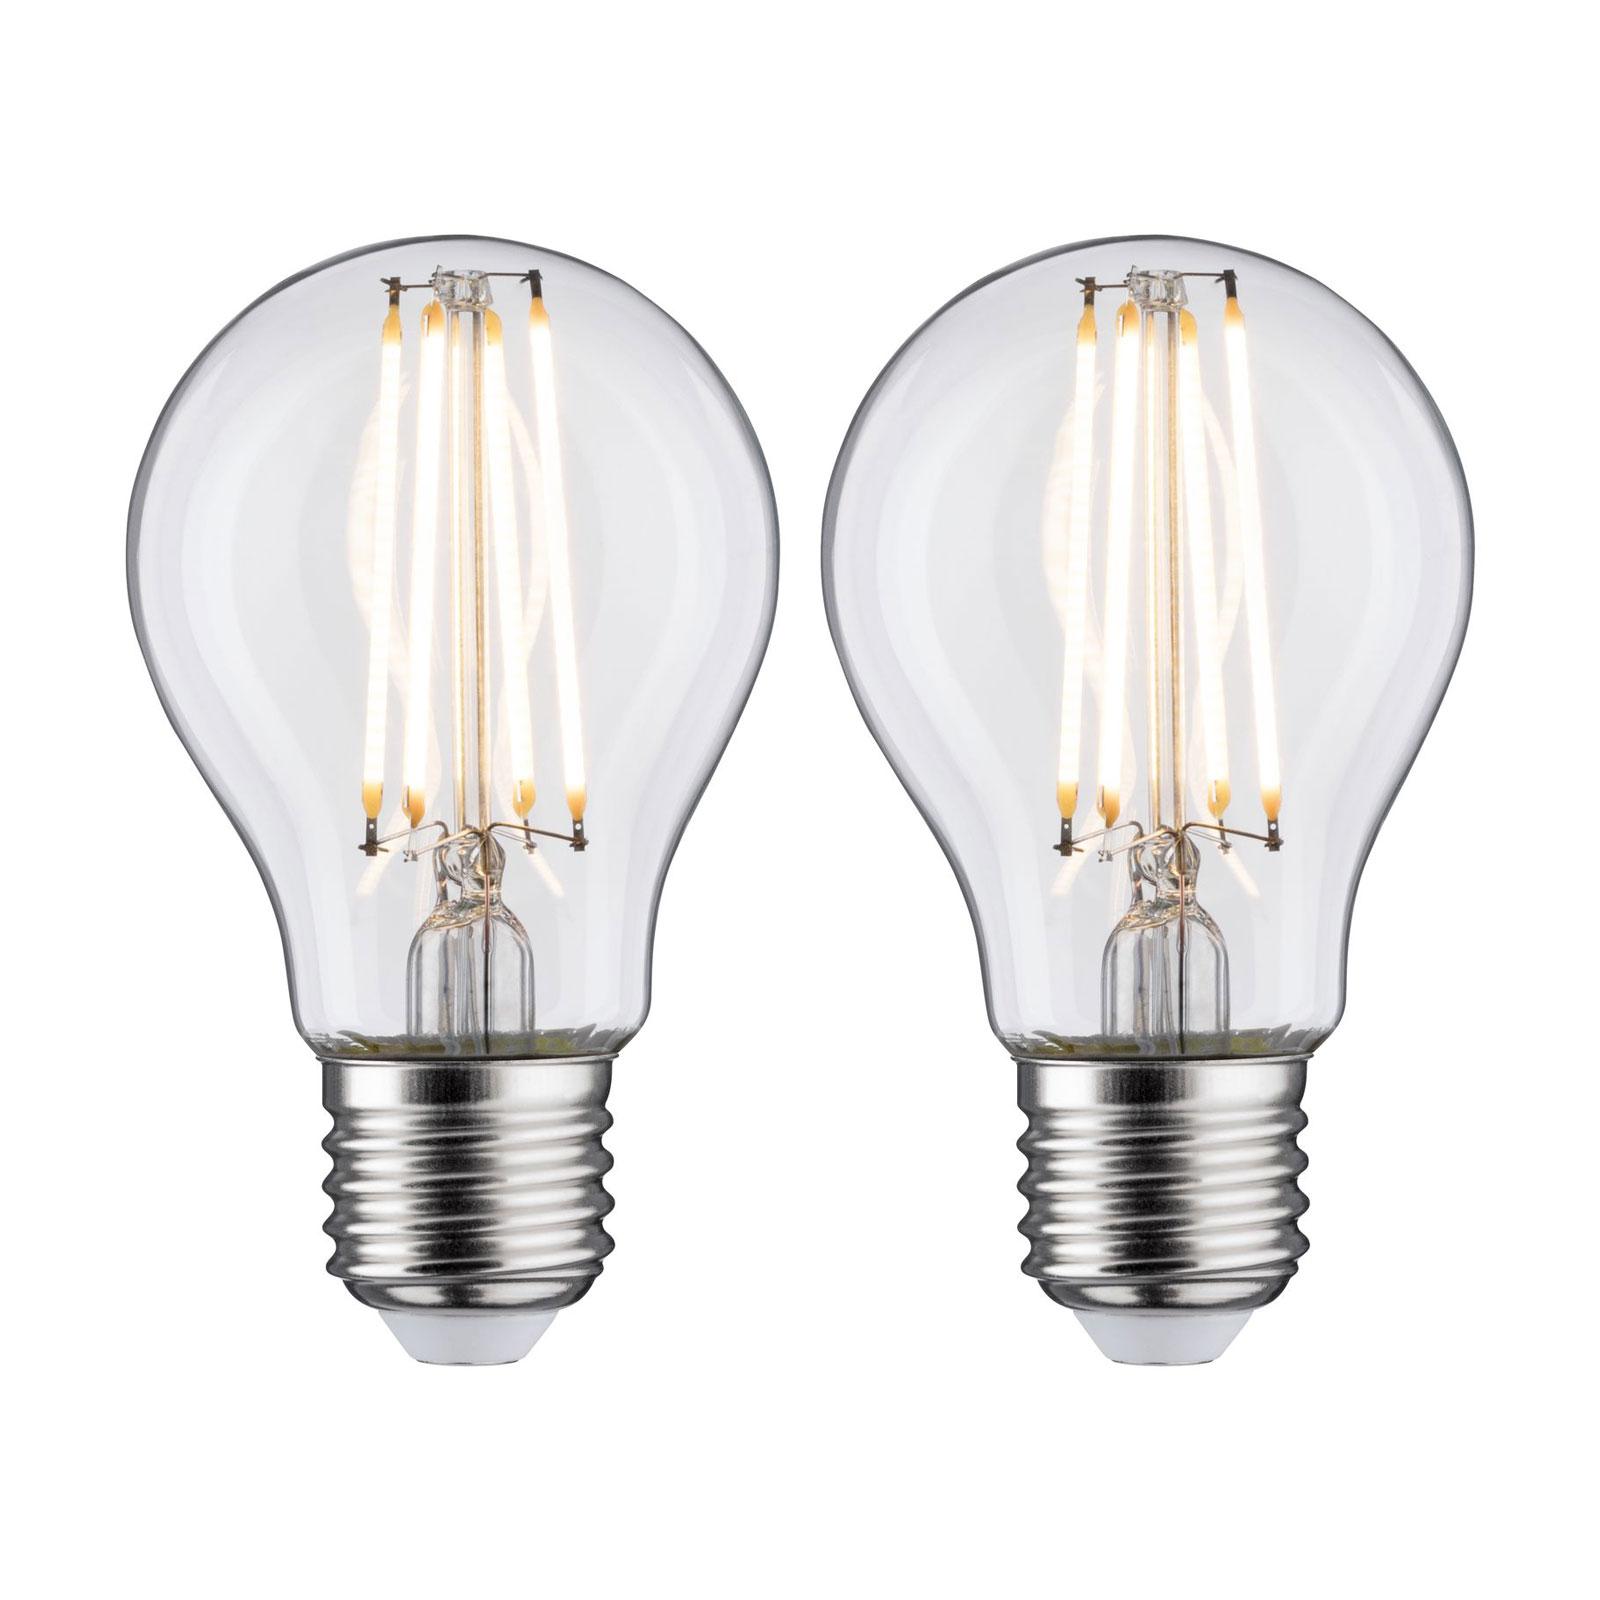 LED E27 7W filamenti 2.700K trasparente 2x Illuminazione per interni